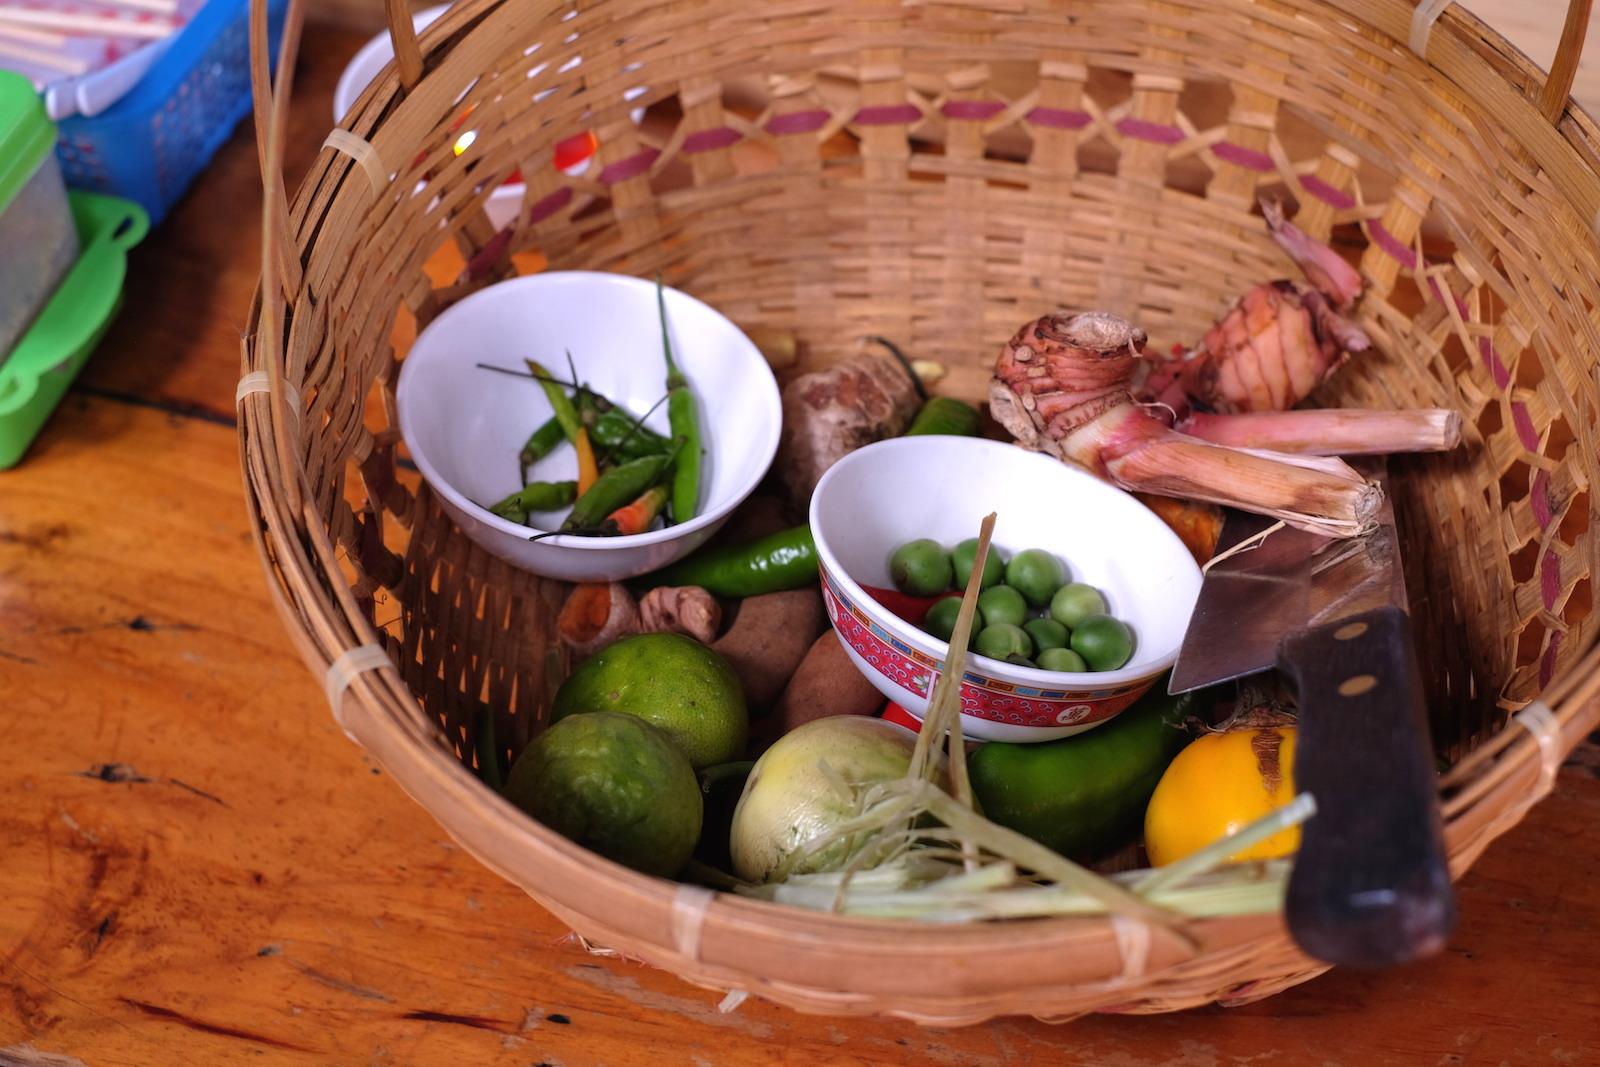 Chiang Mai Thai Farm Cooking School herbs and spices